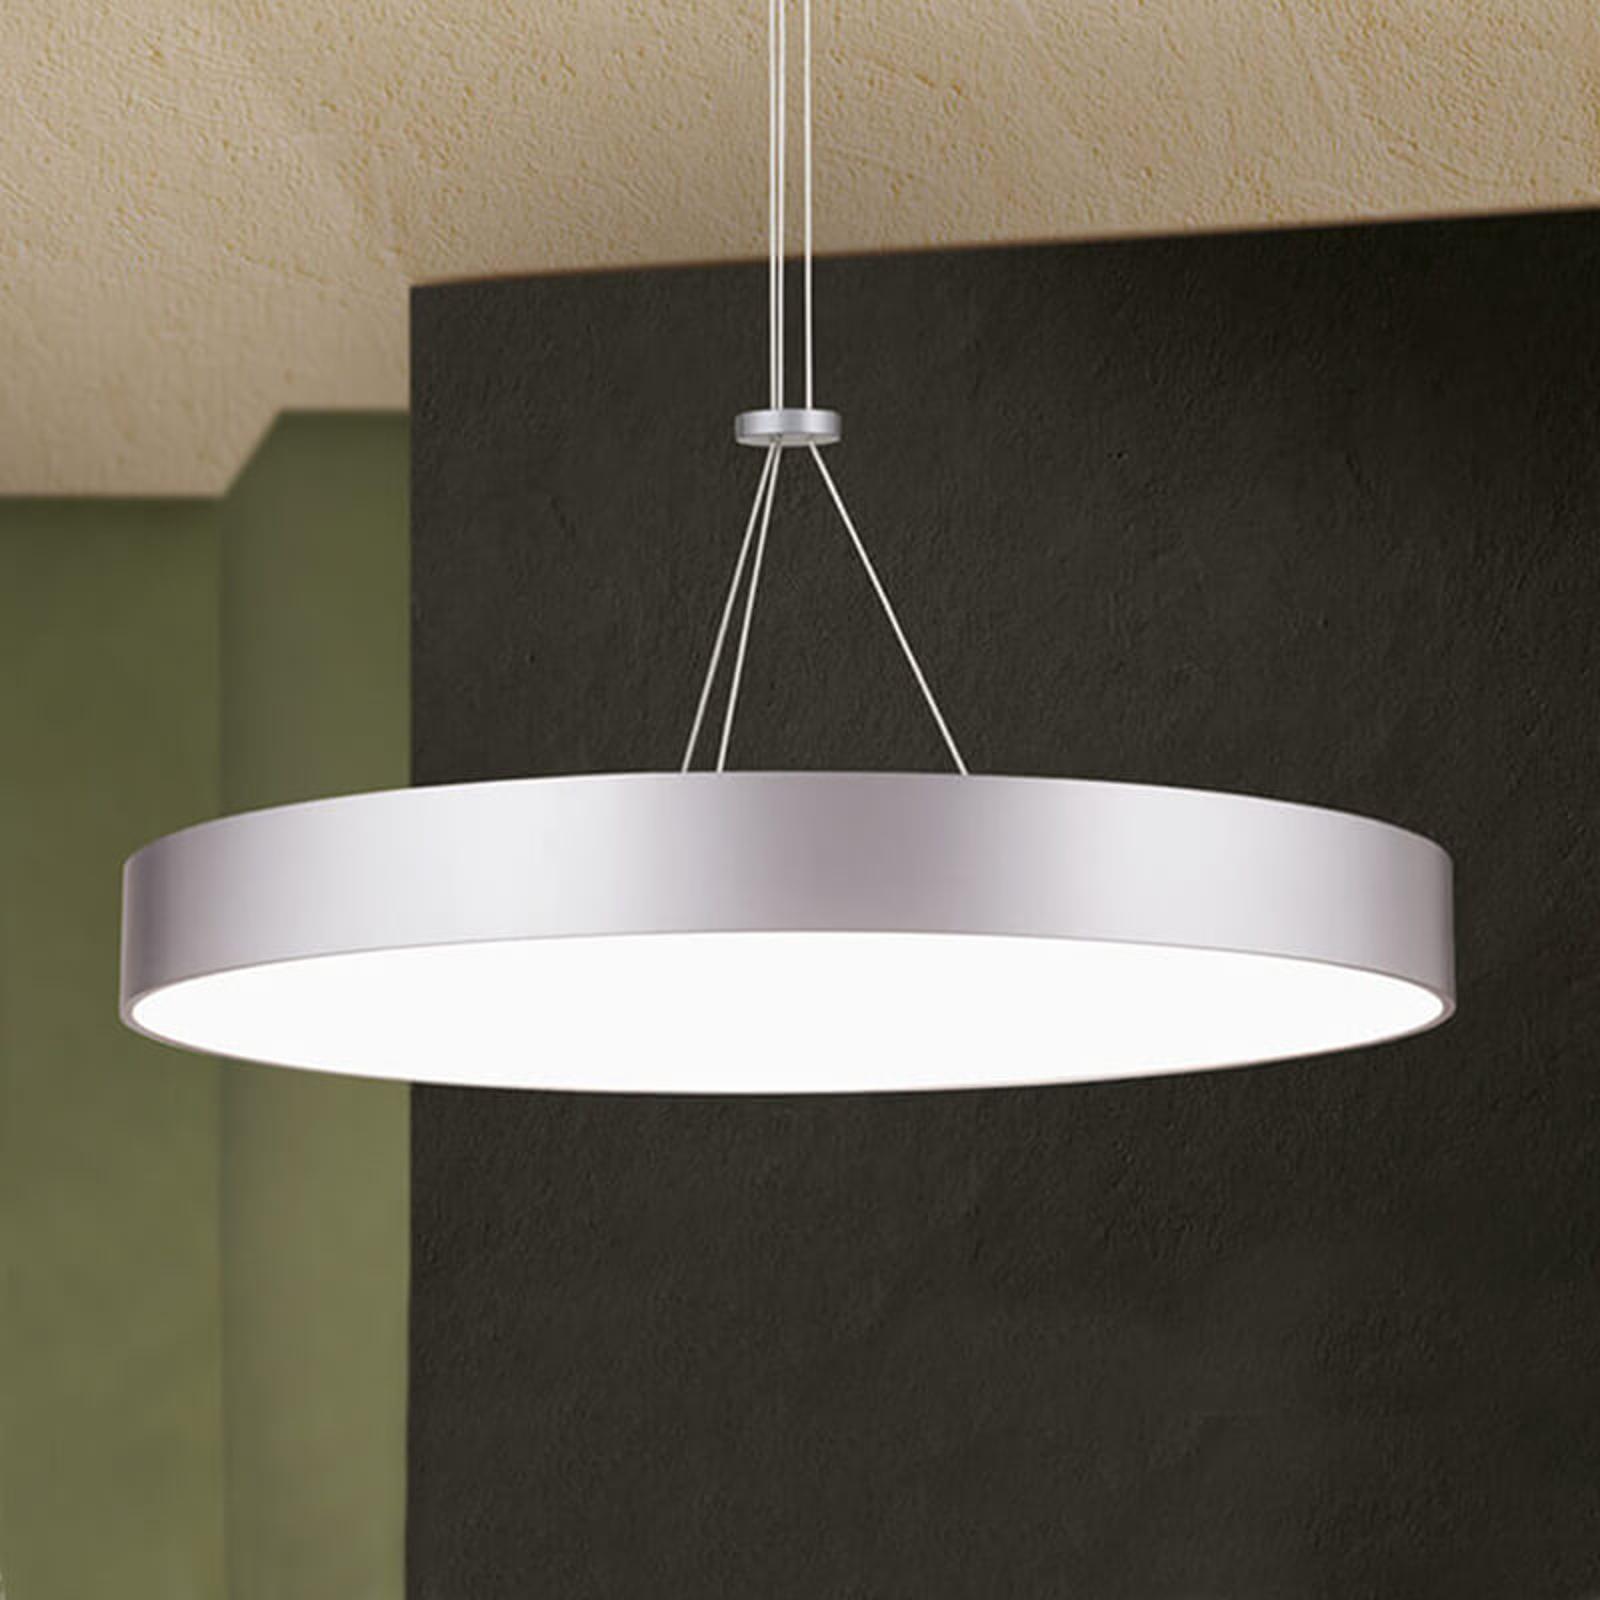 Runde LED-Hängeleuchte Egilo - dimmbar